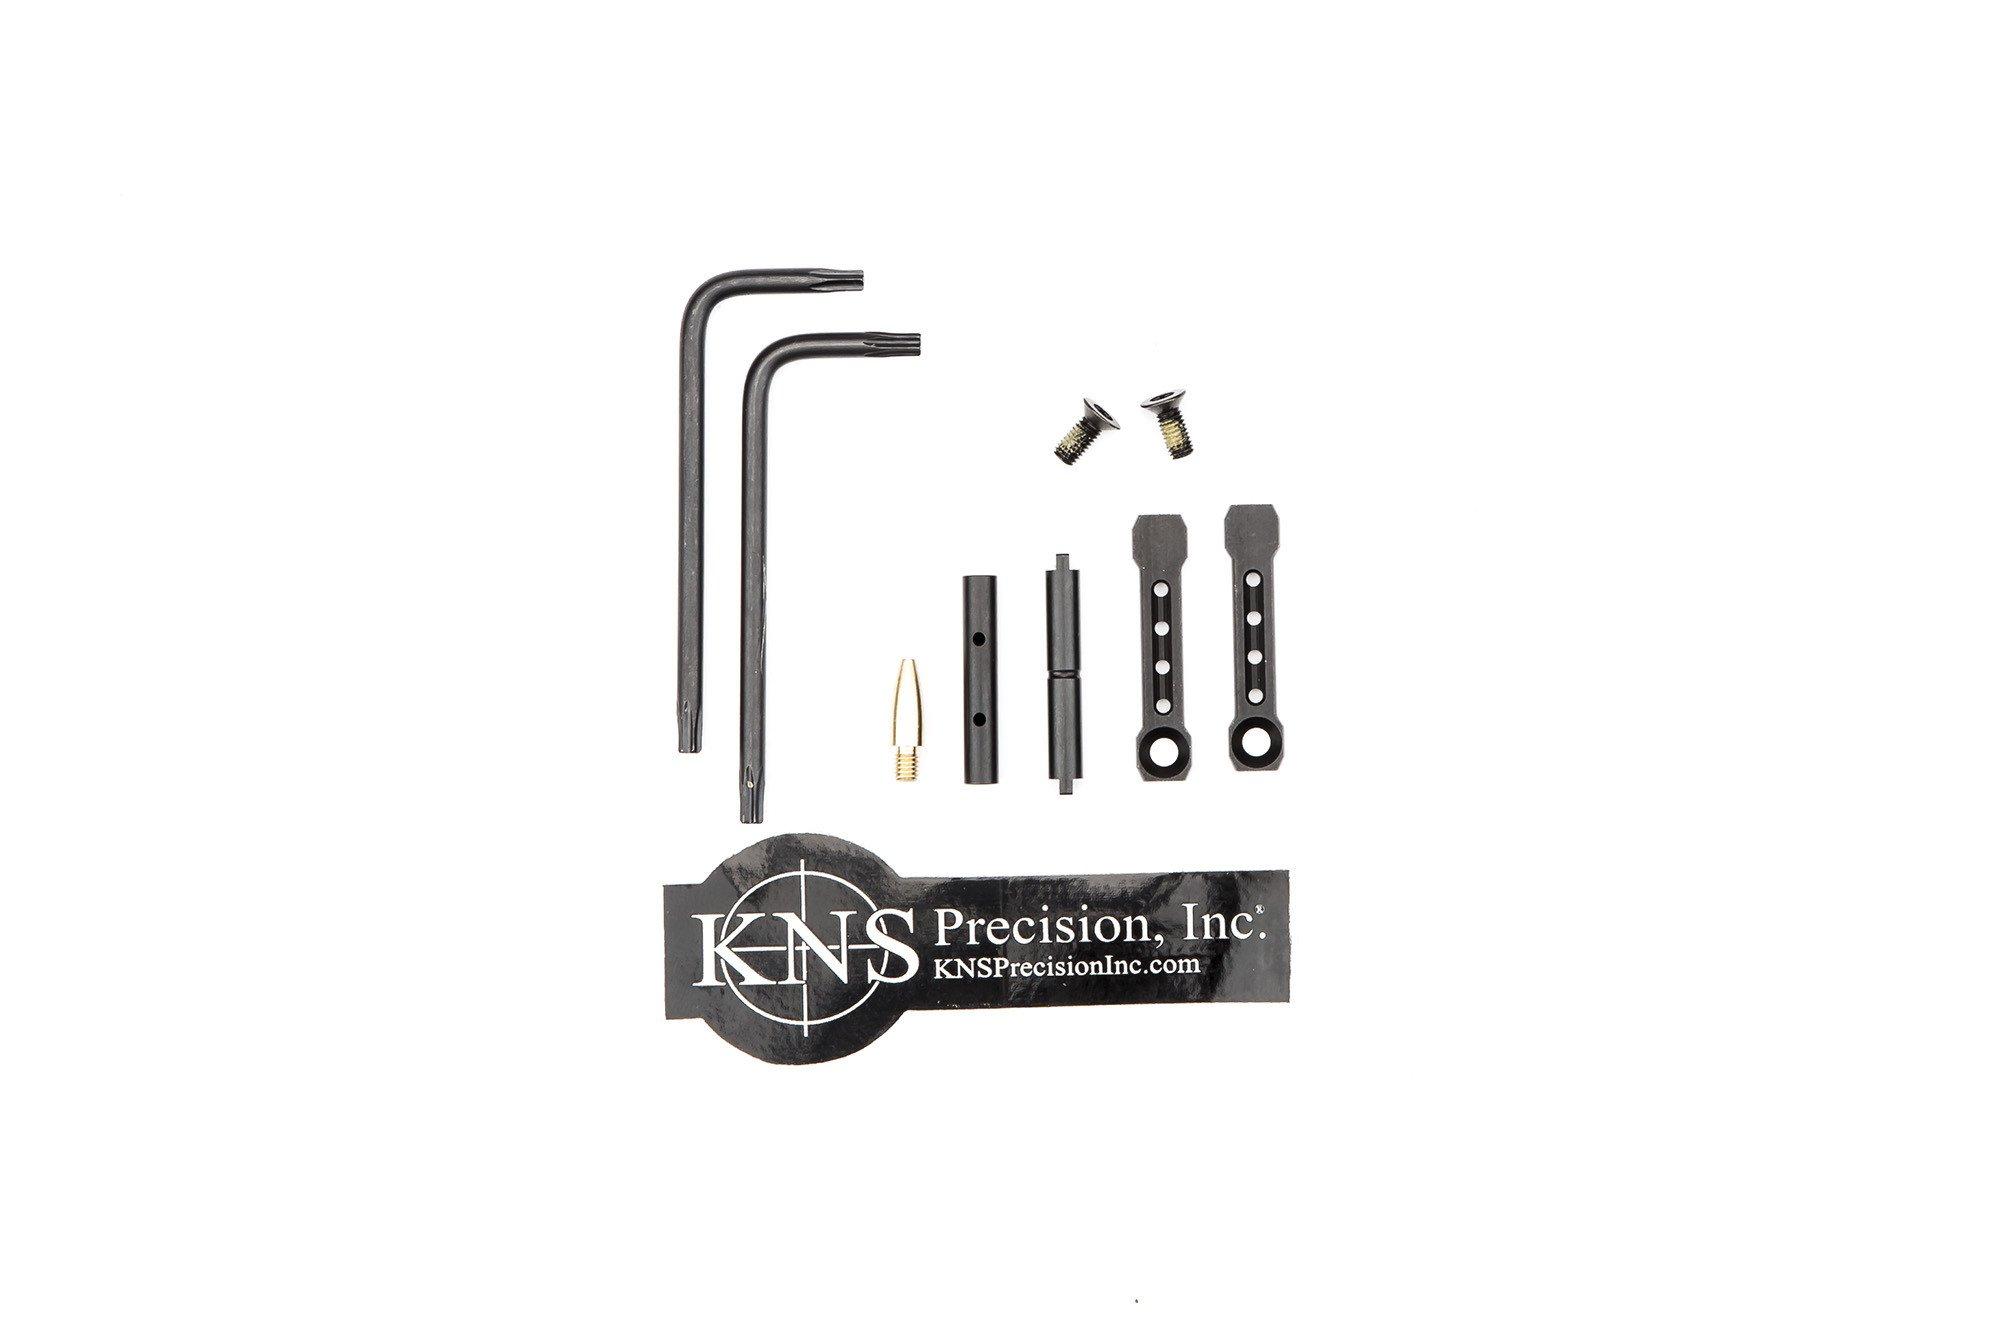 KNS Anti Rotation Pins Gen 2 Mod ST